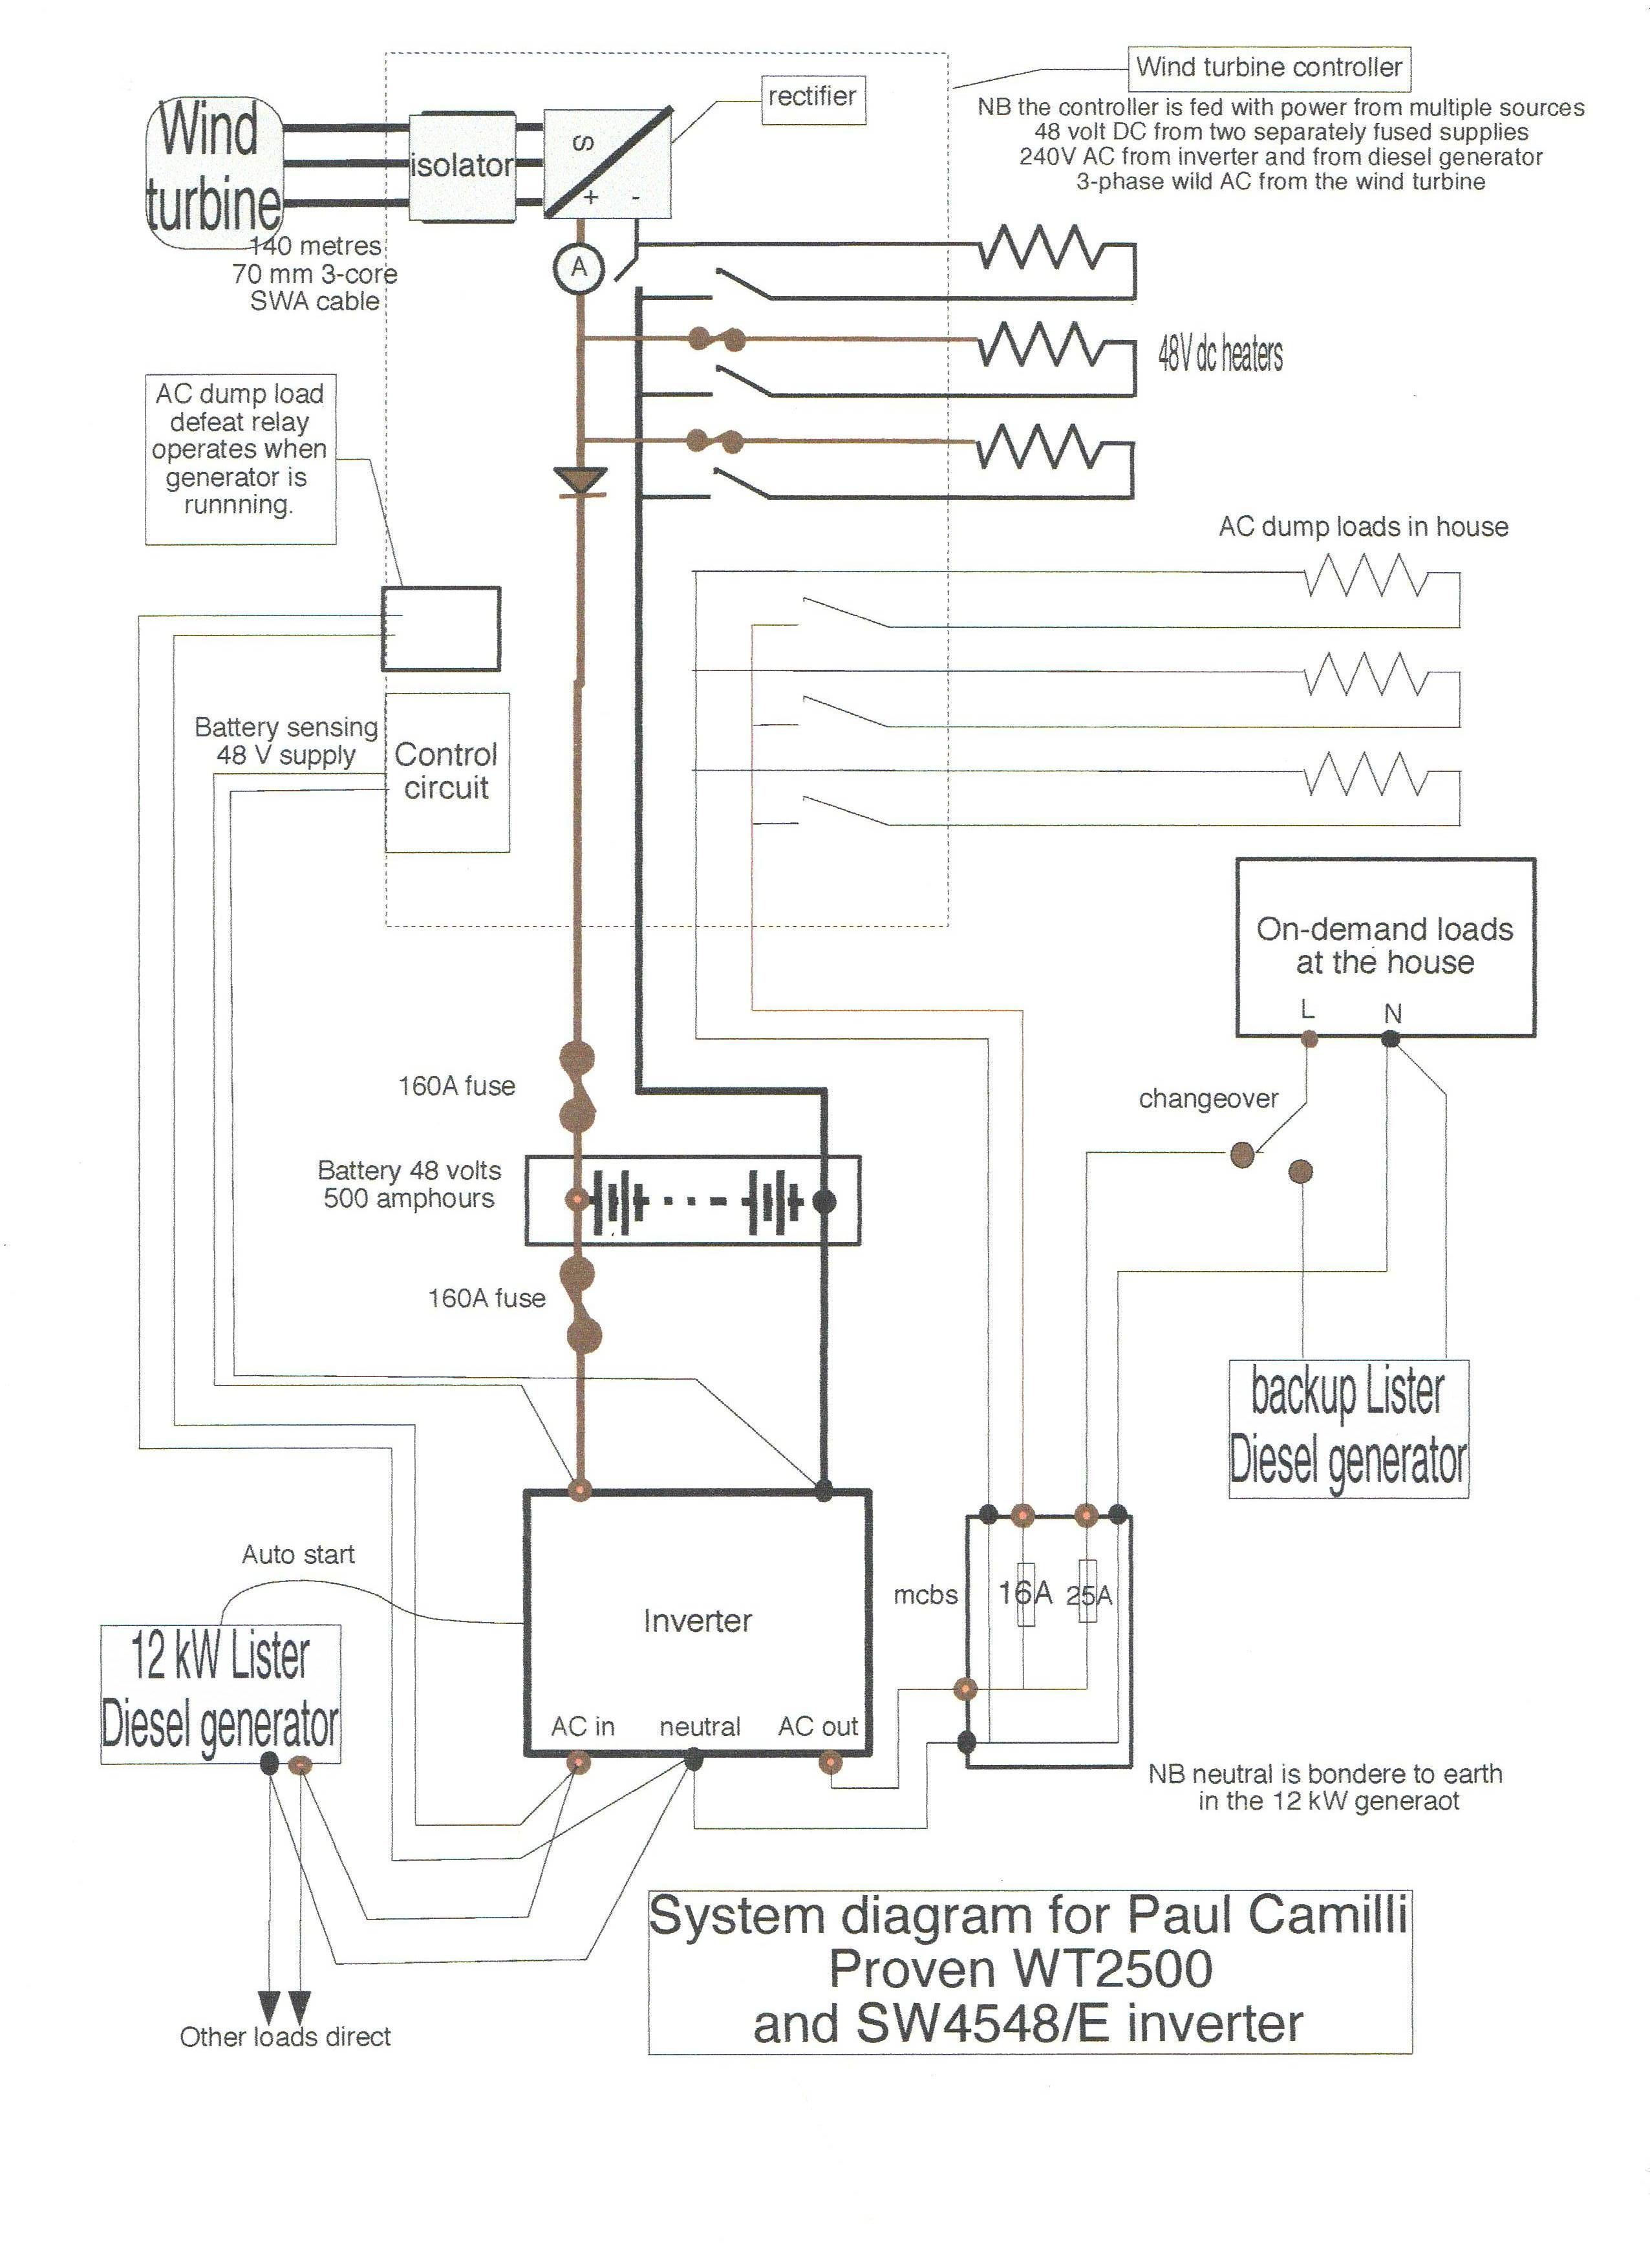 Wind turbine wiring diagram | house decor | Wind power